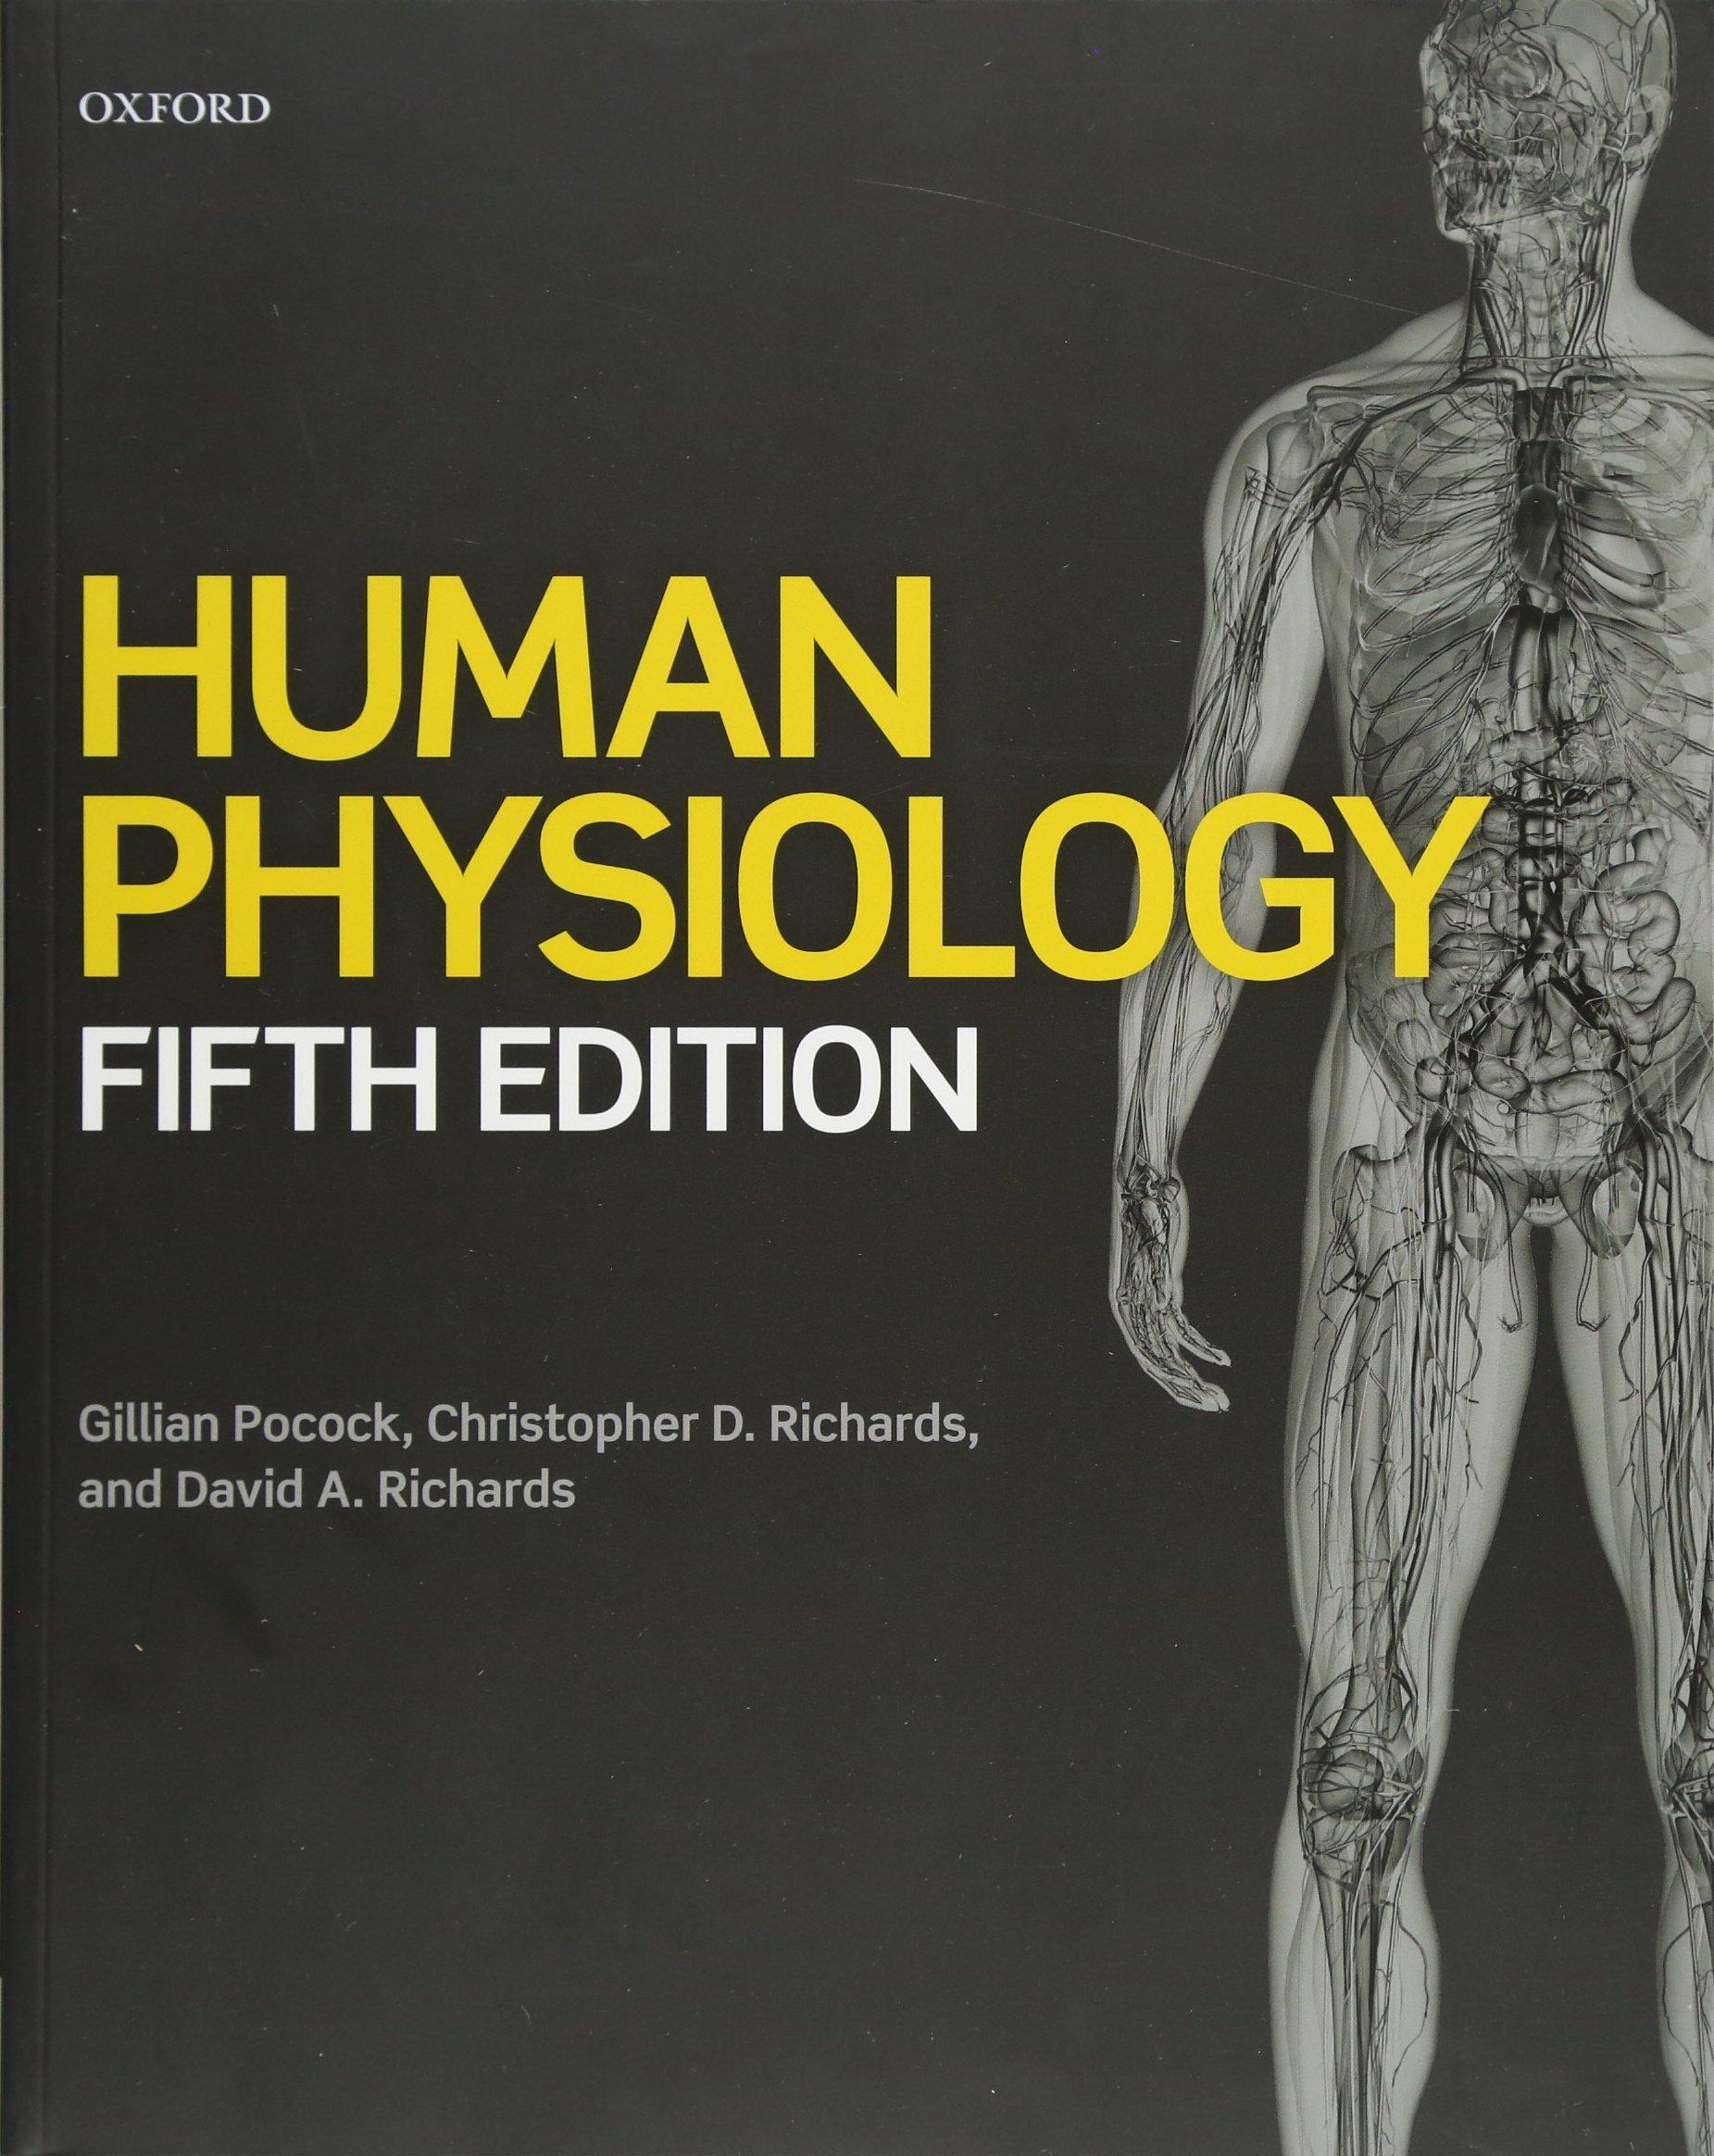 Human Physiology: Amazon.co.uk: Gillian Pocock, Christopher D ...